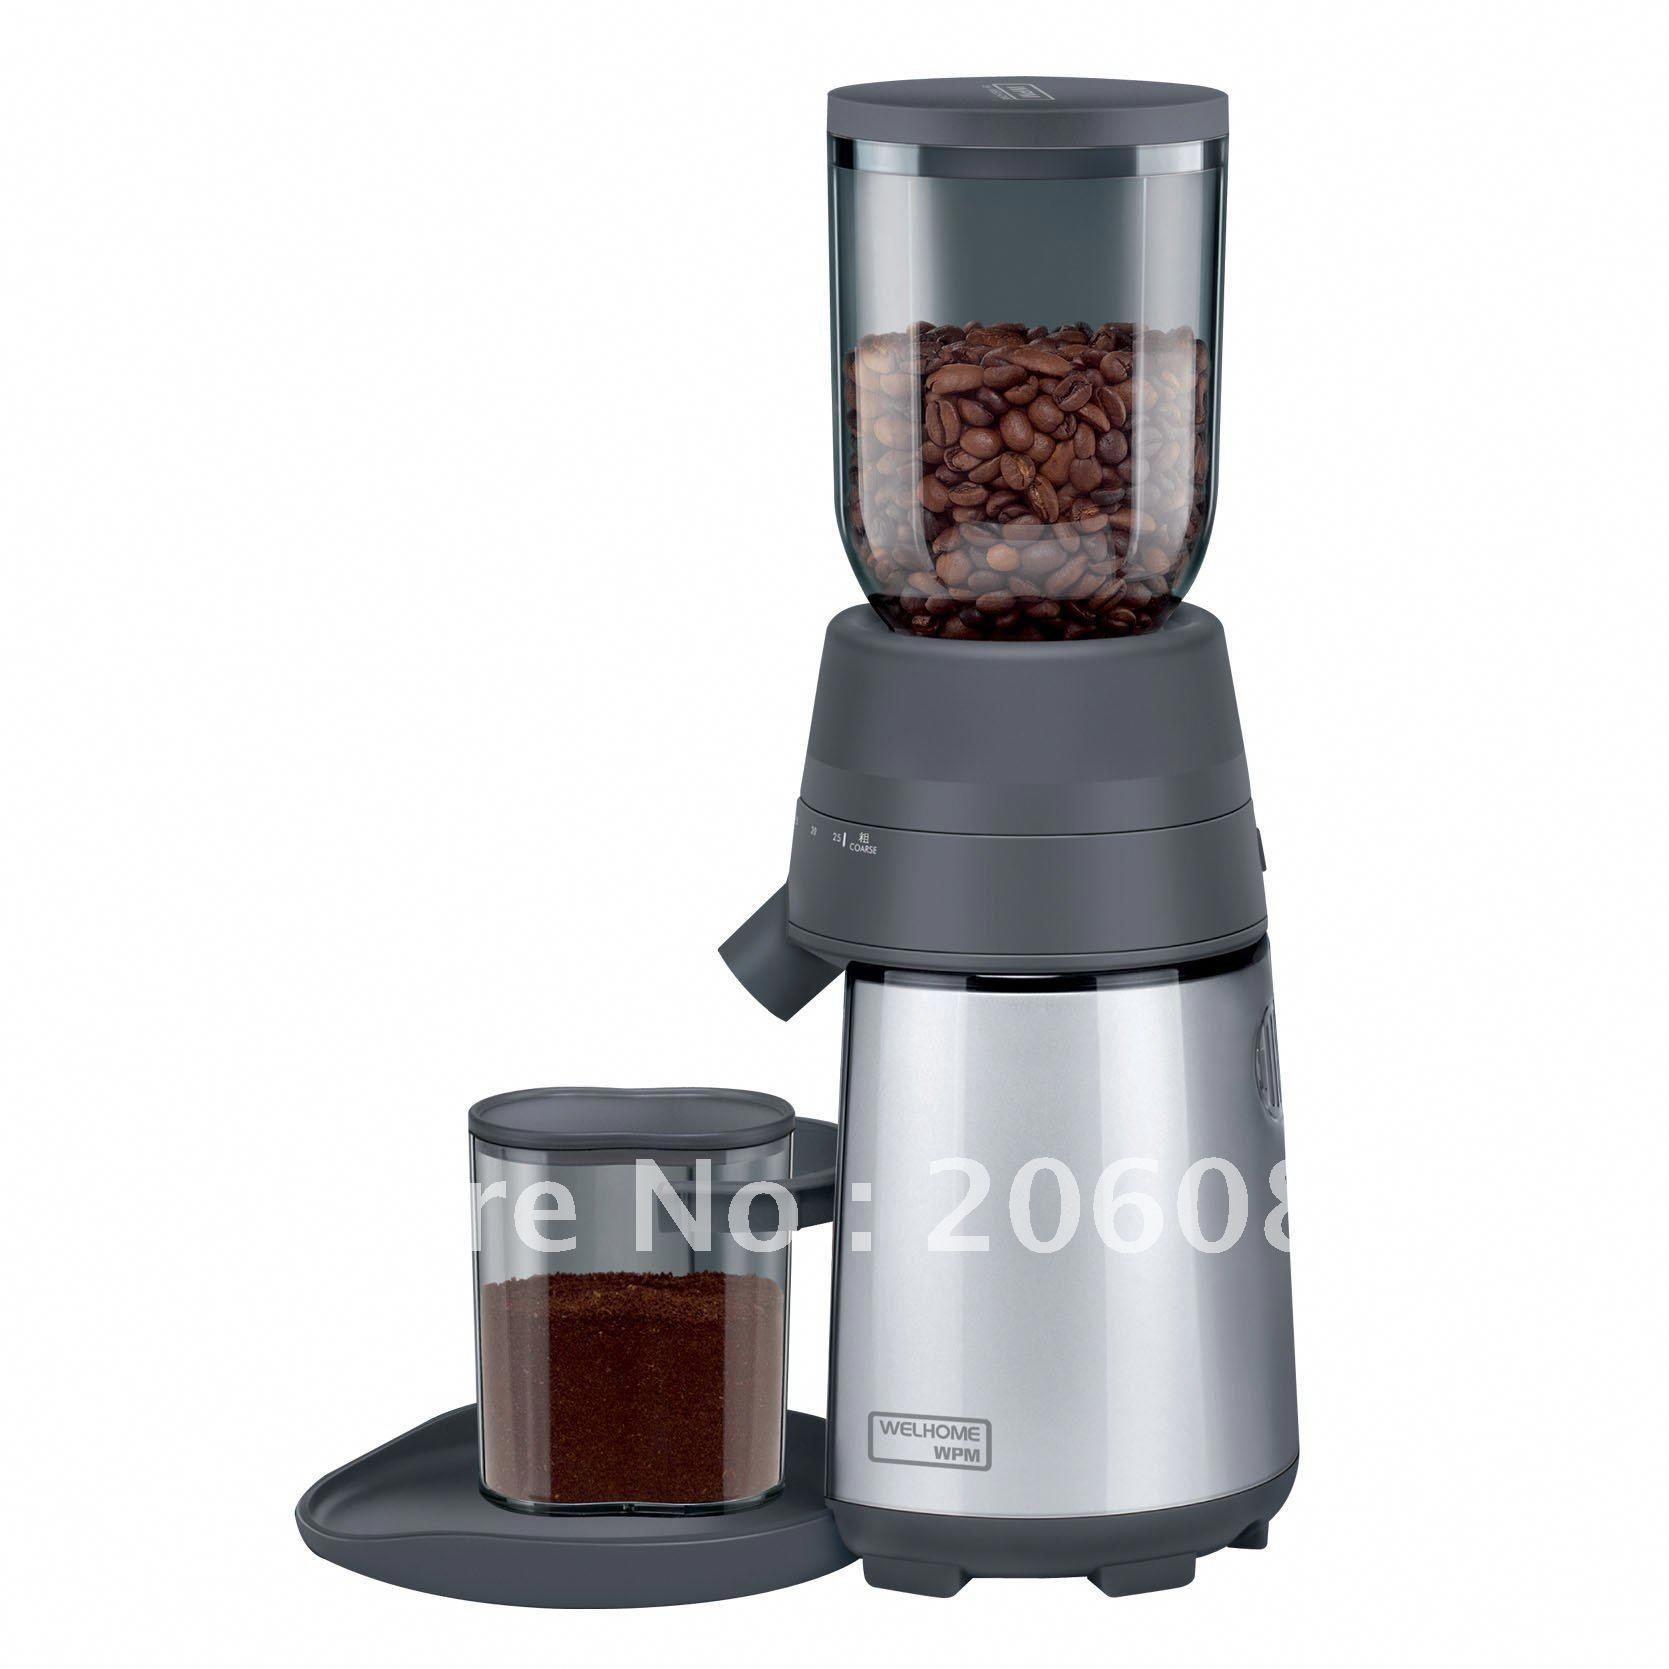 29 Splendid Coffee Grinder Wet Dry Coffee Grinder Non Electric